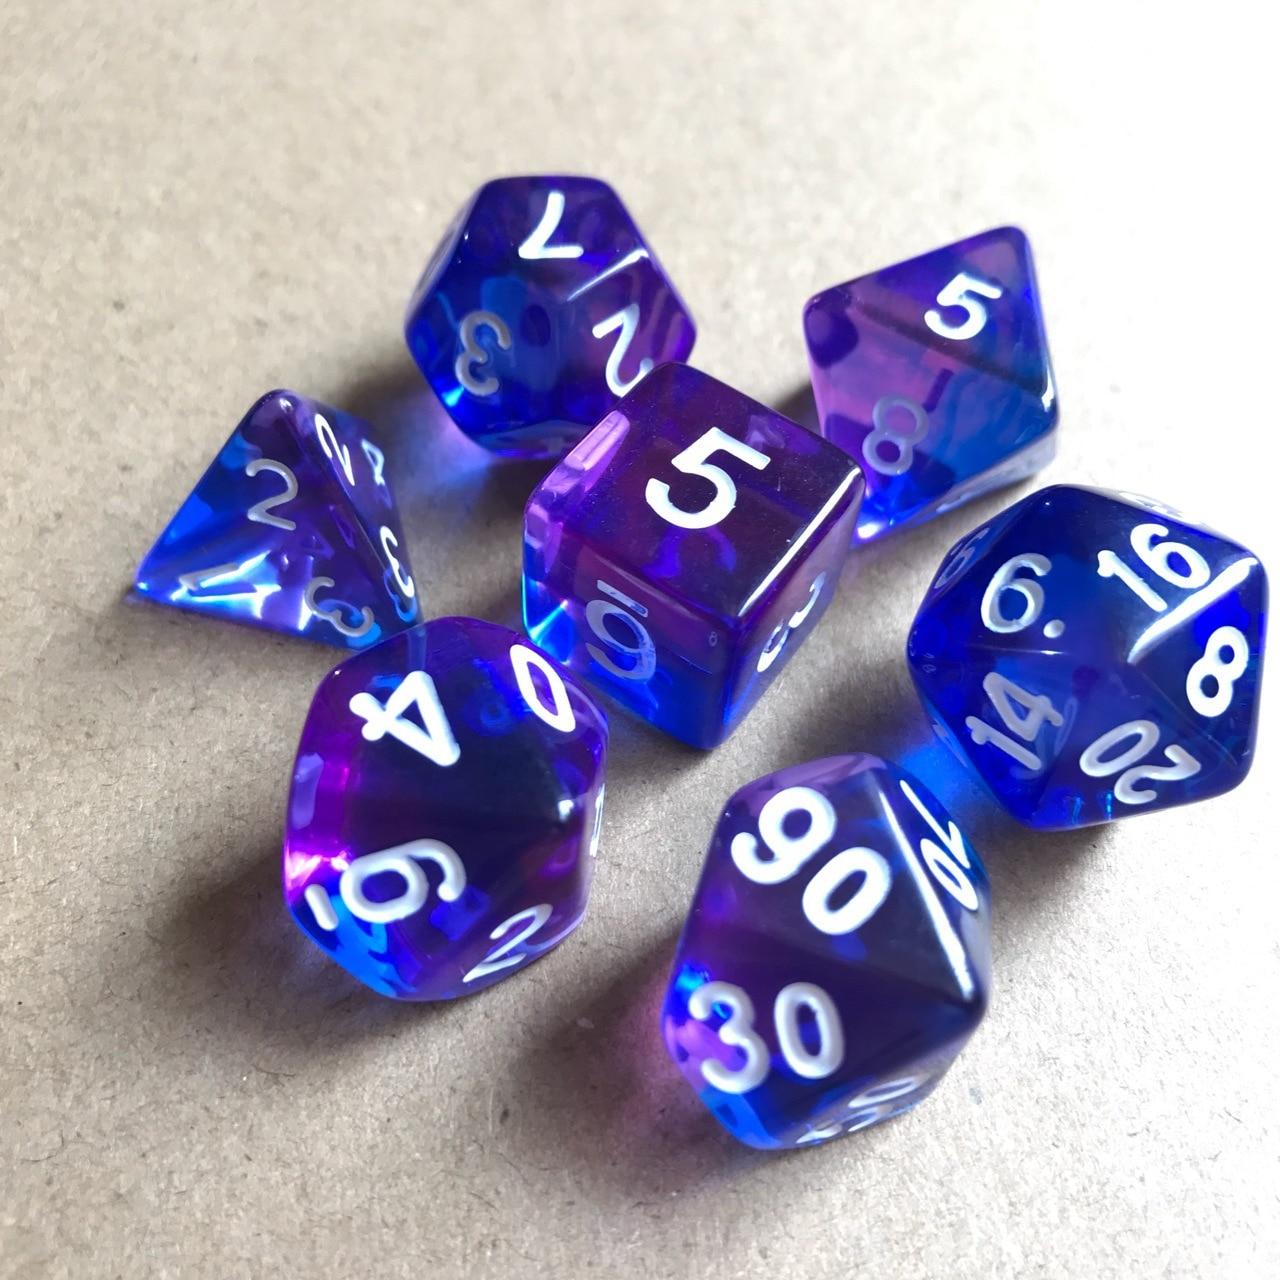 7pcs/set Transparent Resin Polyhedral Dice D4 D6 D8 D10 D12 D20 For Board Game Entertainment Dice